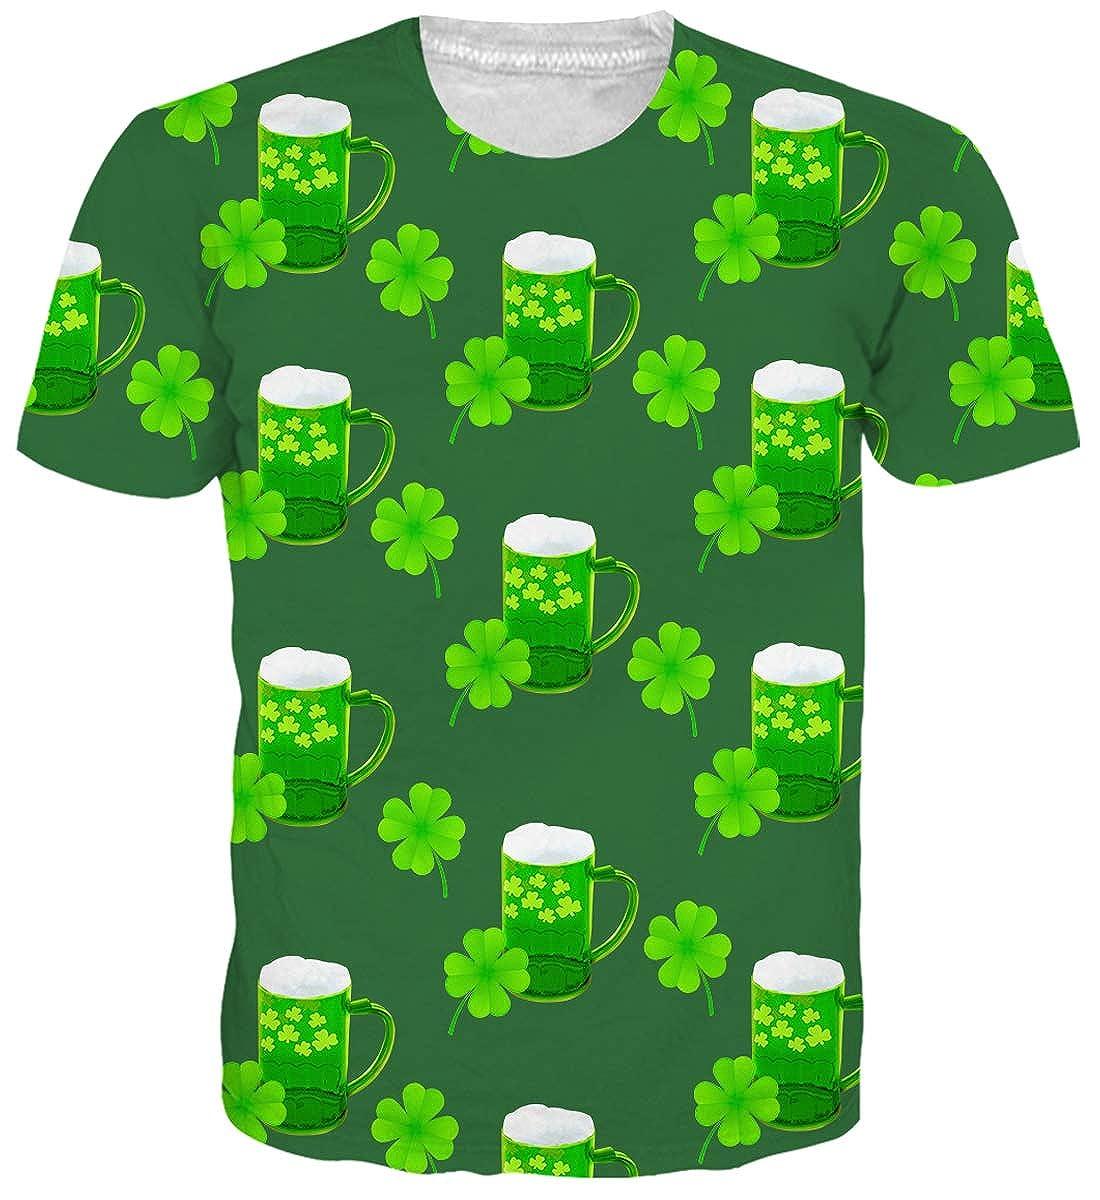 ebf55732c1eb6 Uideazone Men's ST. Patricks Day Shamrock Clover Printed Button Down Shirt  Green Hawaiian Shirt Gift Shirts